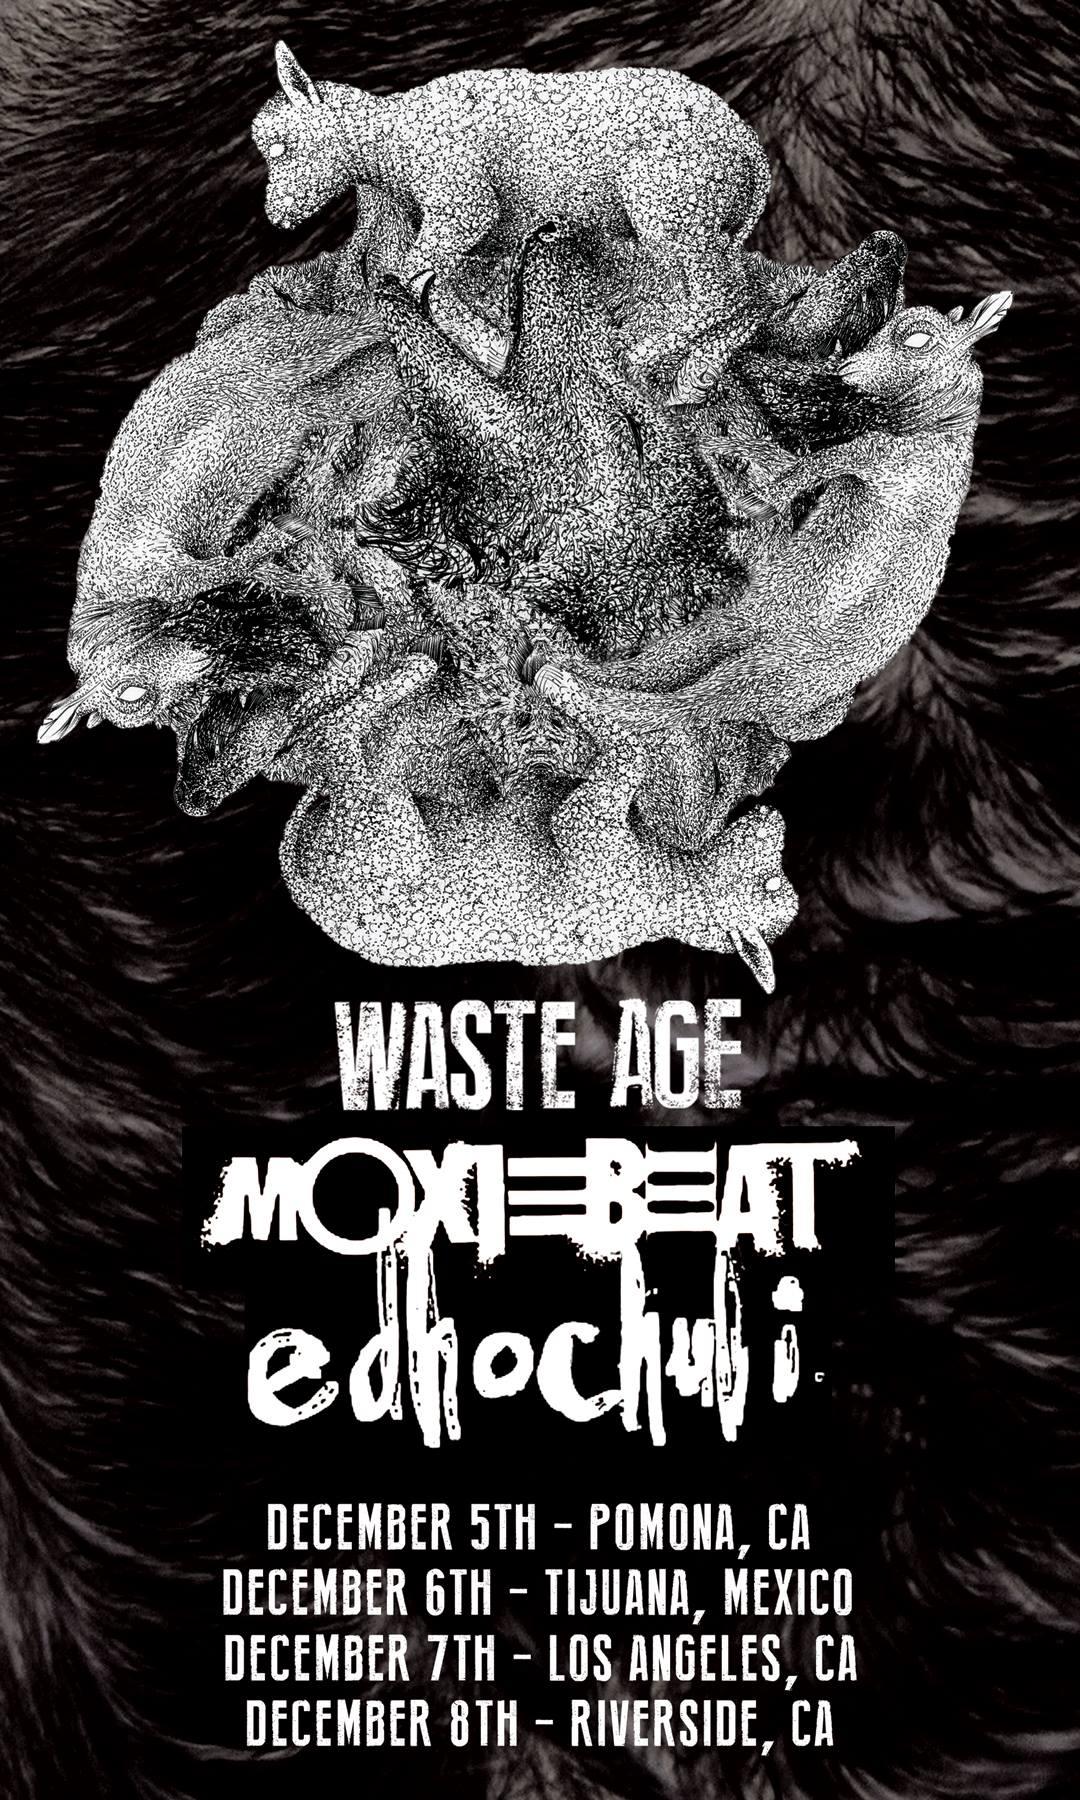 WINTER TOUR 2015 - Waste Age, Edhochuli, Moxiebeat